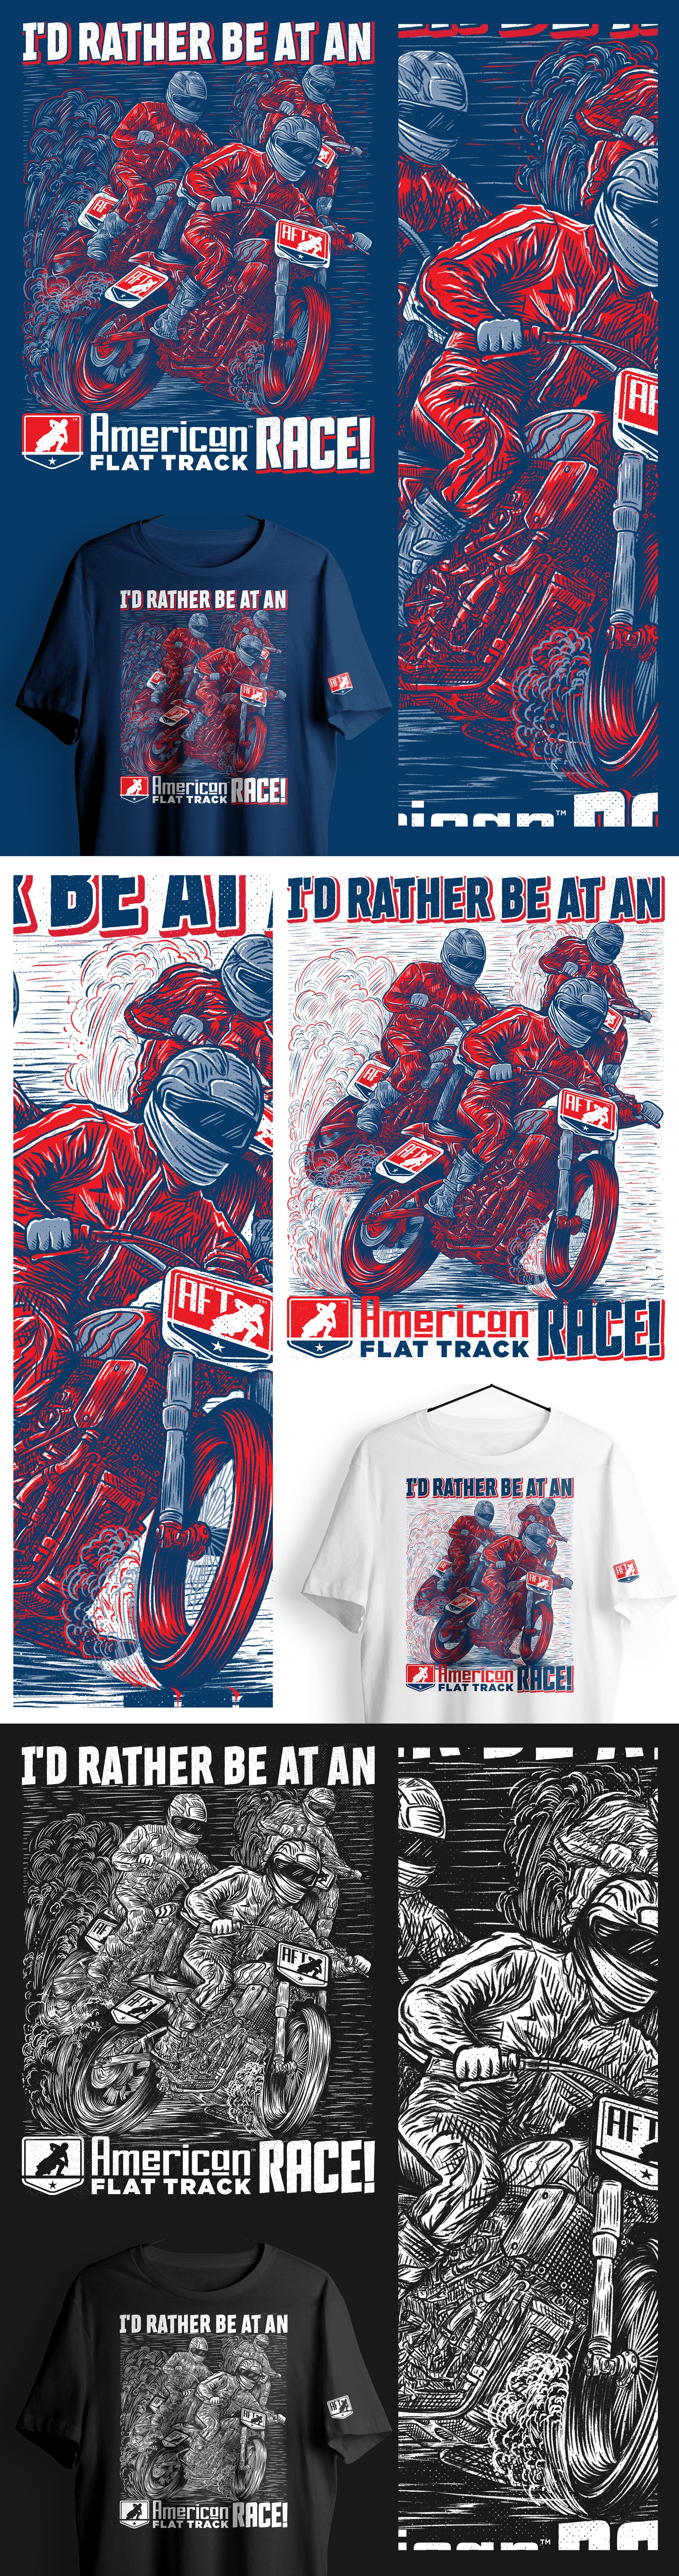 Graphic intense shirt illustration